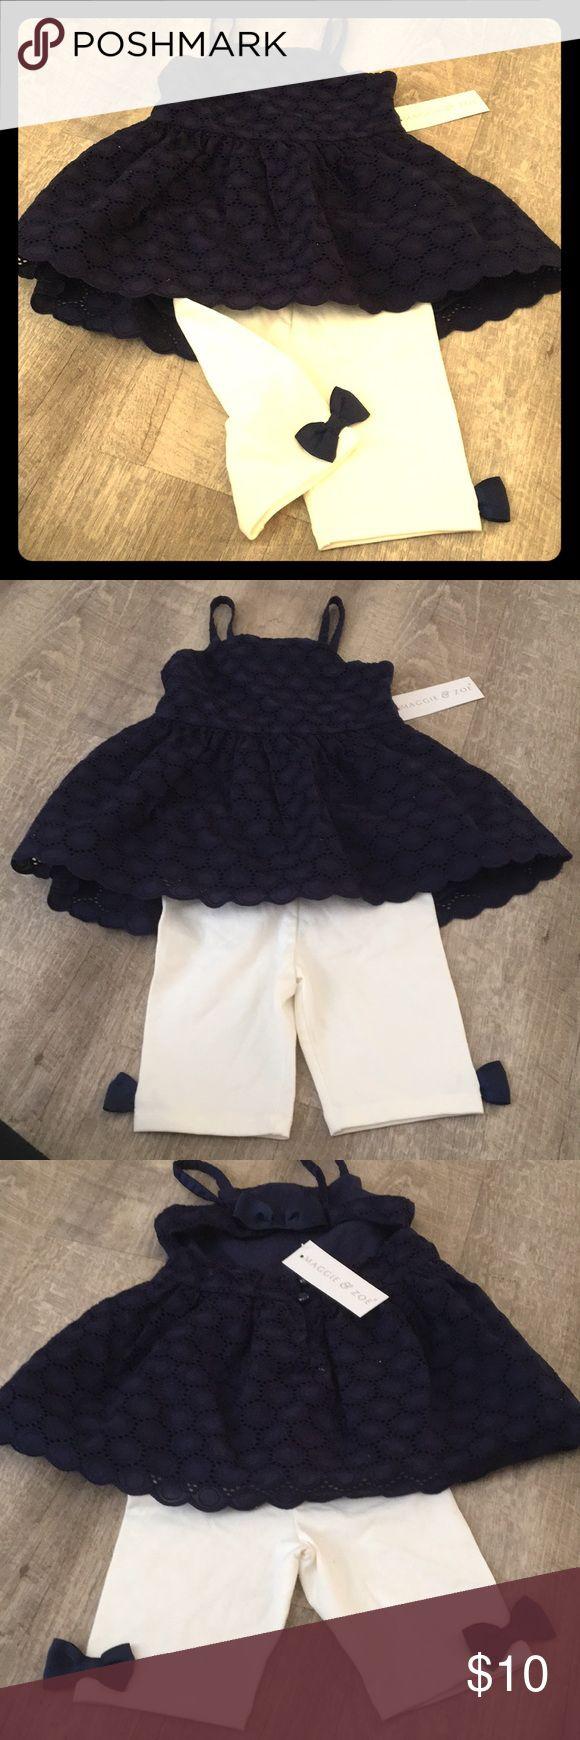 Maggie & Zoe two piece sun dress Knit midi dress with cream capri leggings Maggie & Zoe Matching Sets